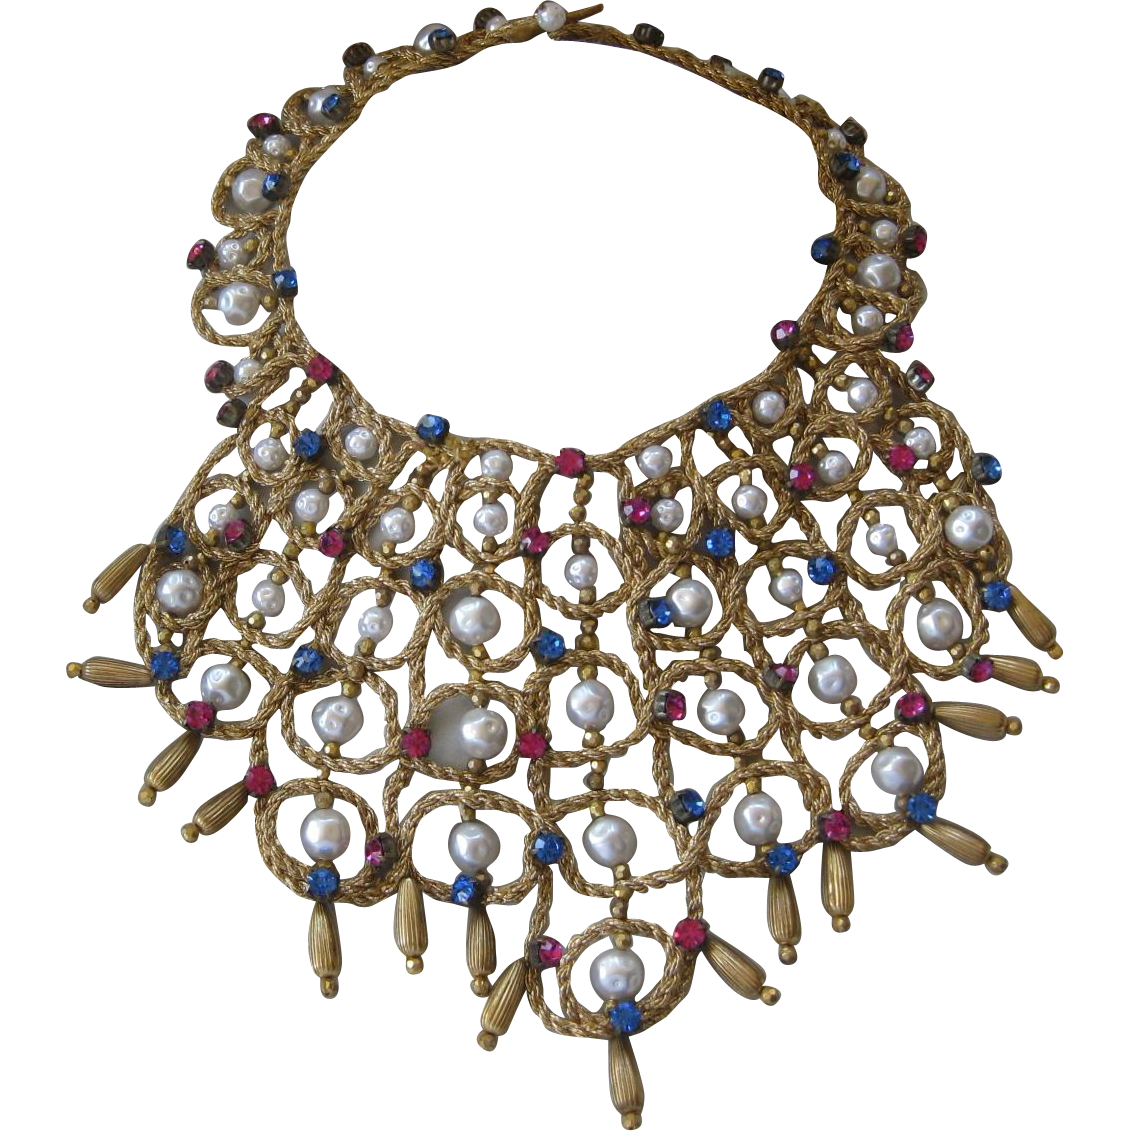 Vintage Couture Woven Rhinestones & Pearls Huge Bib Necklace